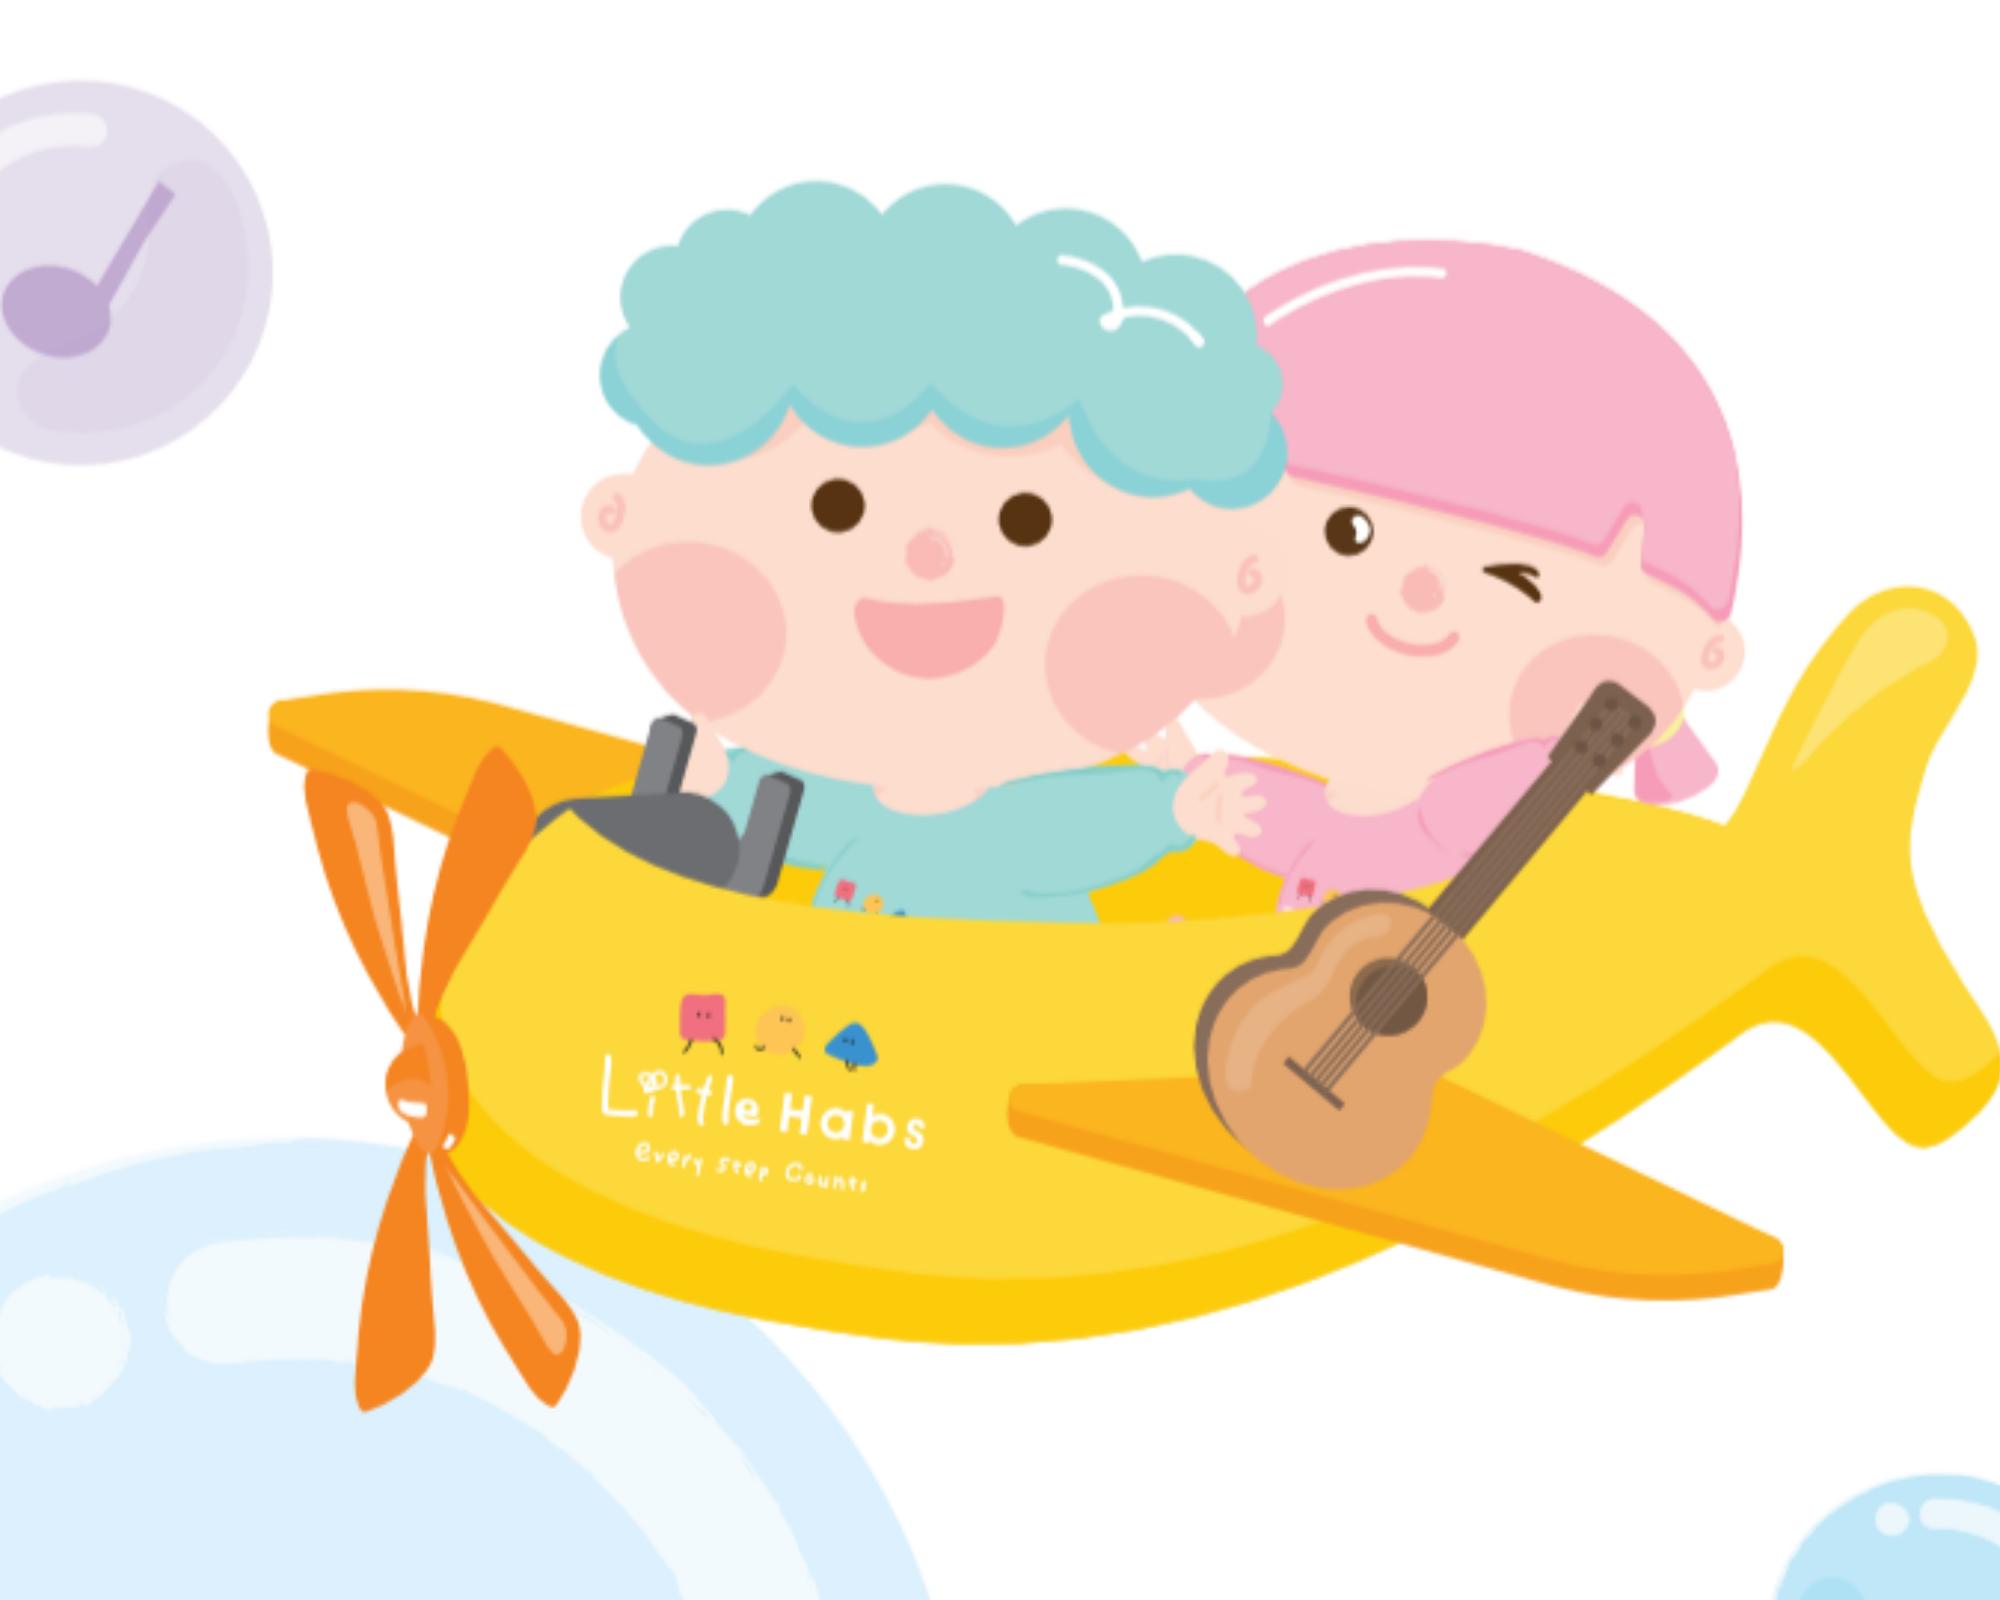 名校幼稚園【學之園】Playgroup《Little Habs》(1)